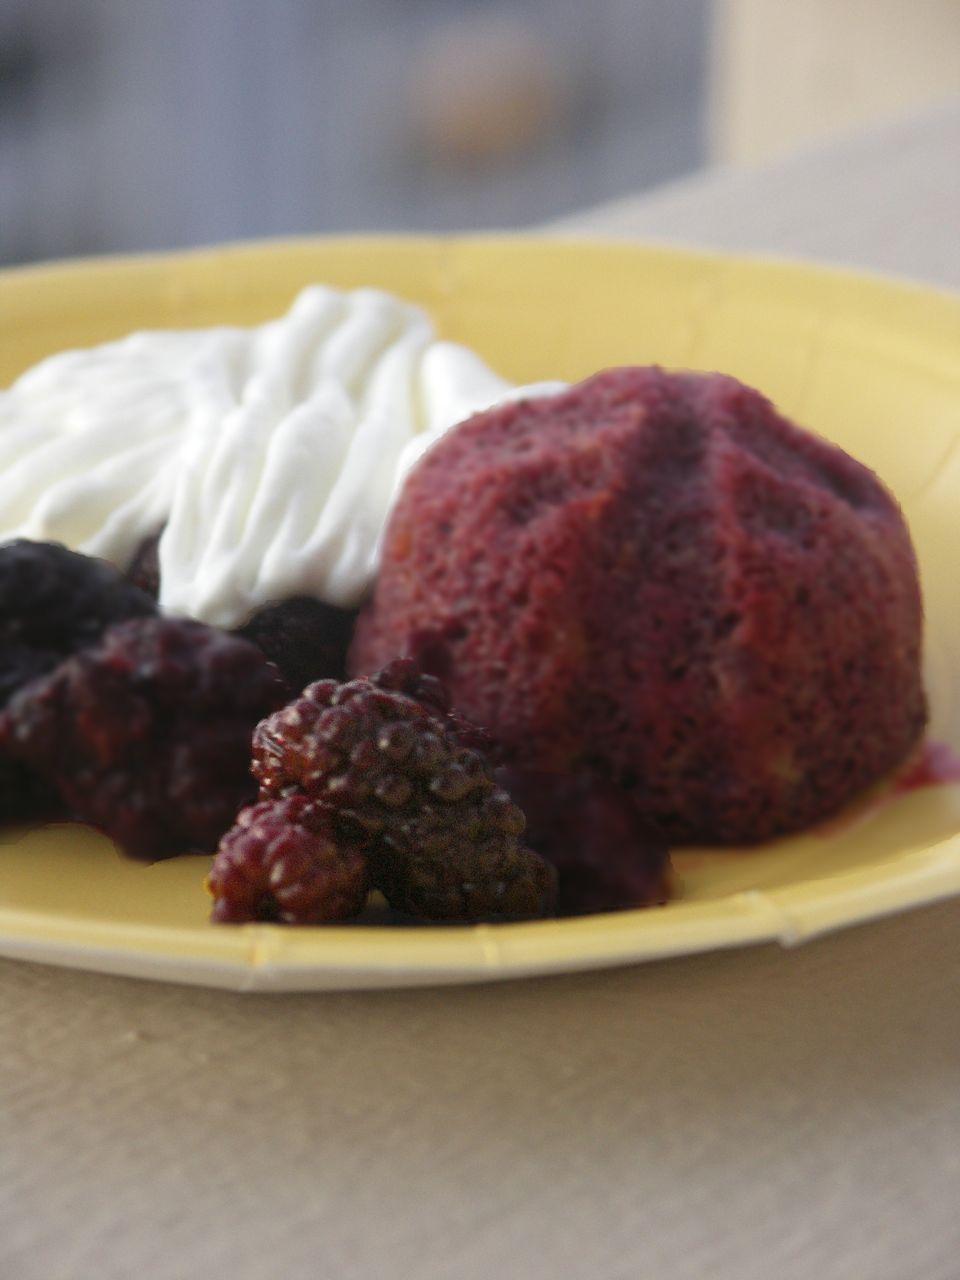 ... heavenly CAKES: Marionberry Shortcake (page 332), alternate photo